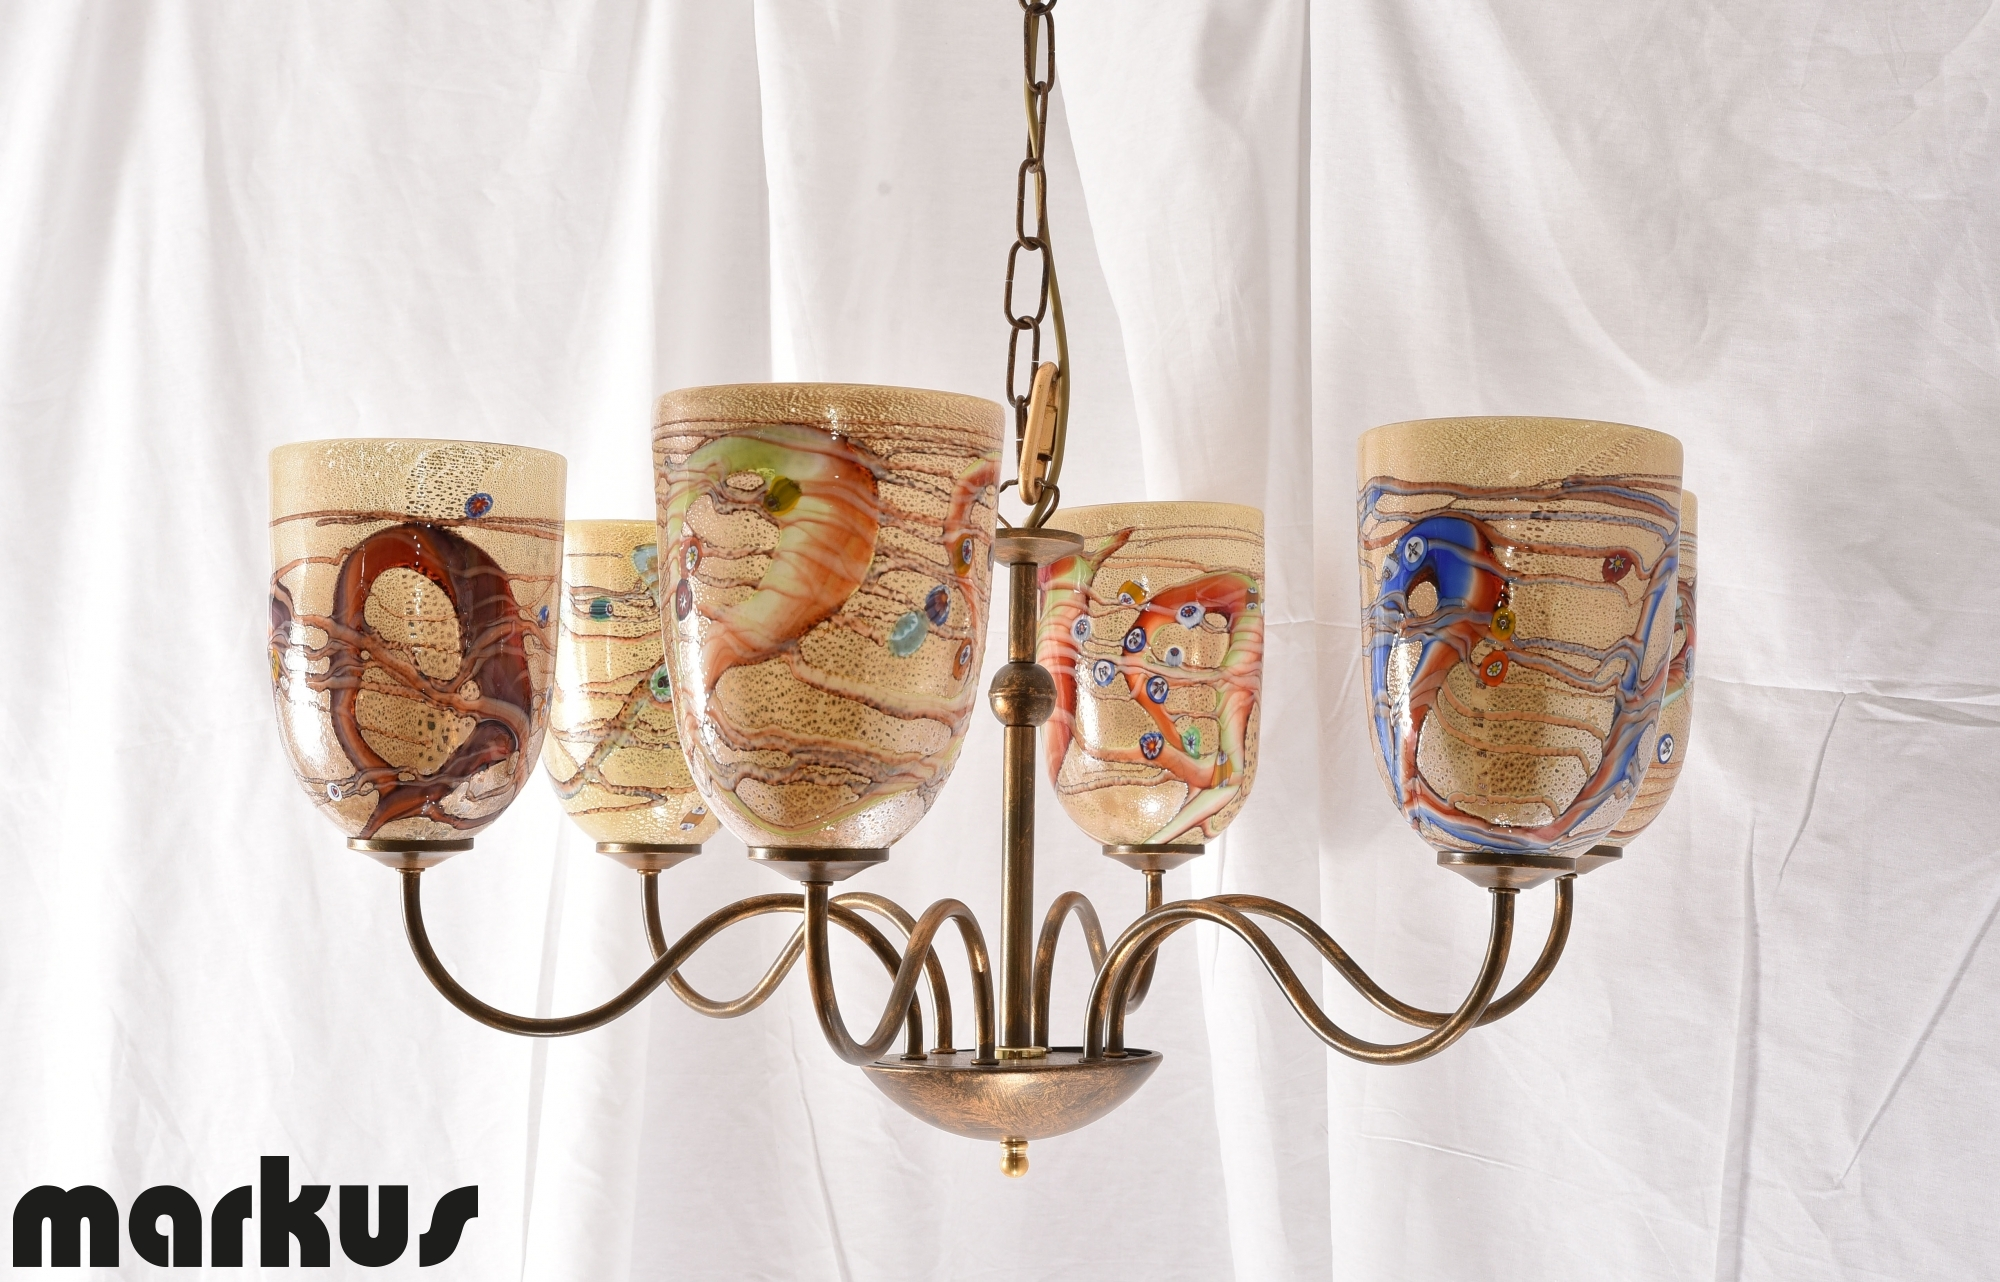 Sostituire Plafoniera Con Lampadario : Lampadario color bronzo con paralumi in vetro luci rivolte su